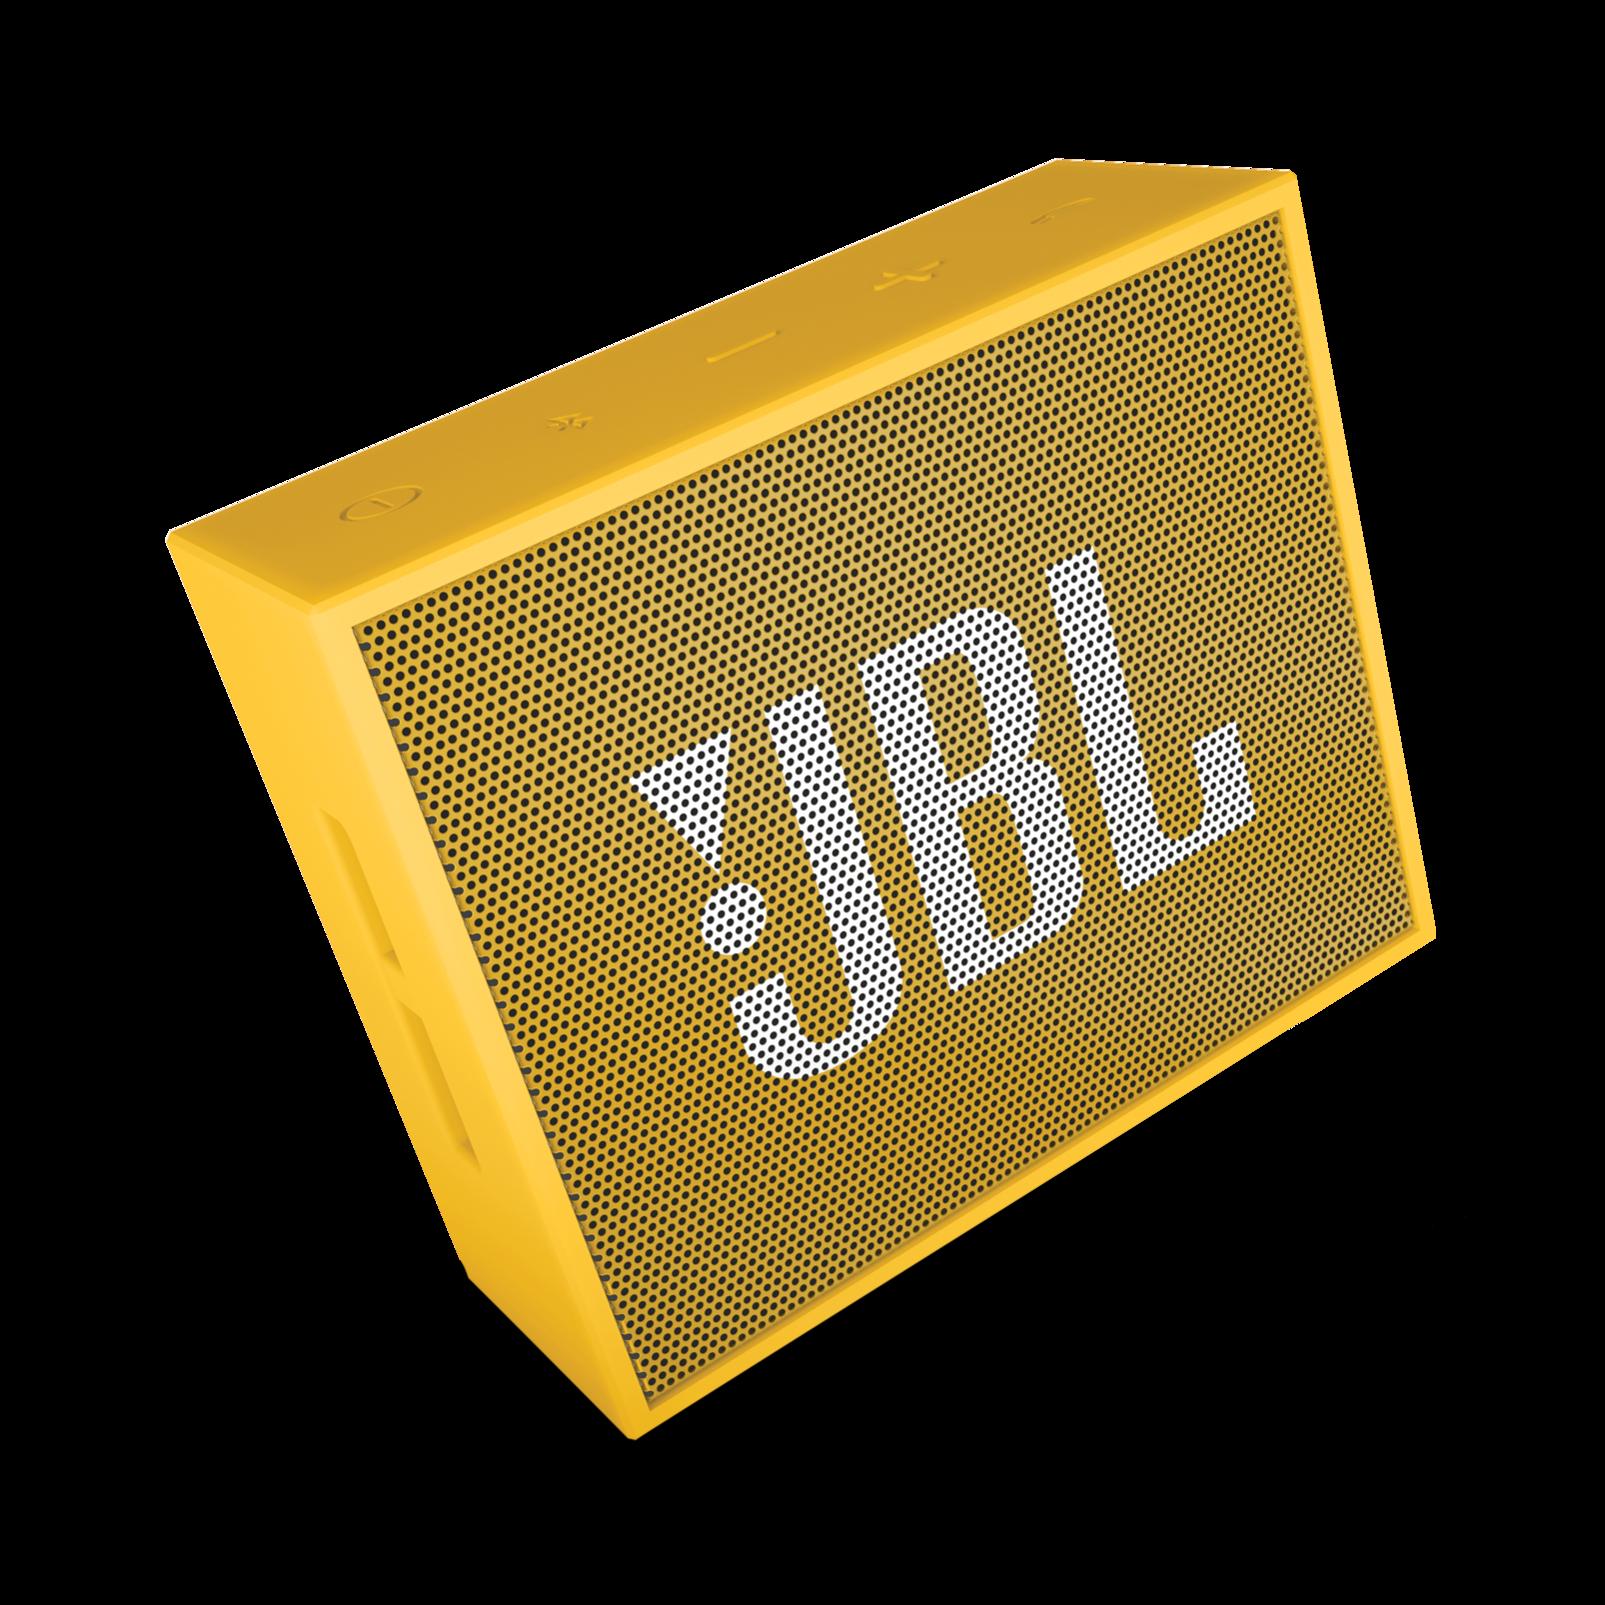 JBL GO - Yellow - Full-featured, great-sounding, great-value portable speaker - Detailshot 3